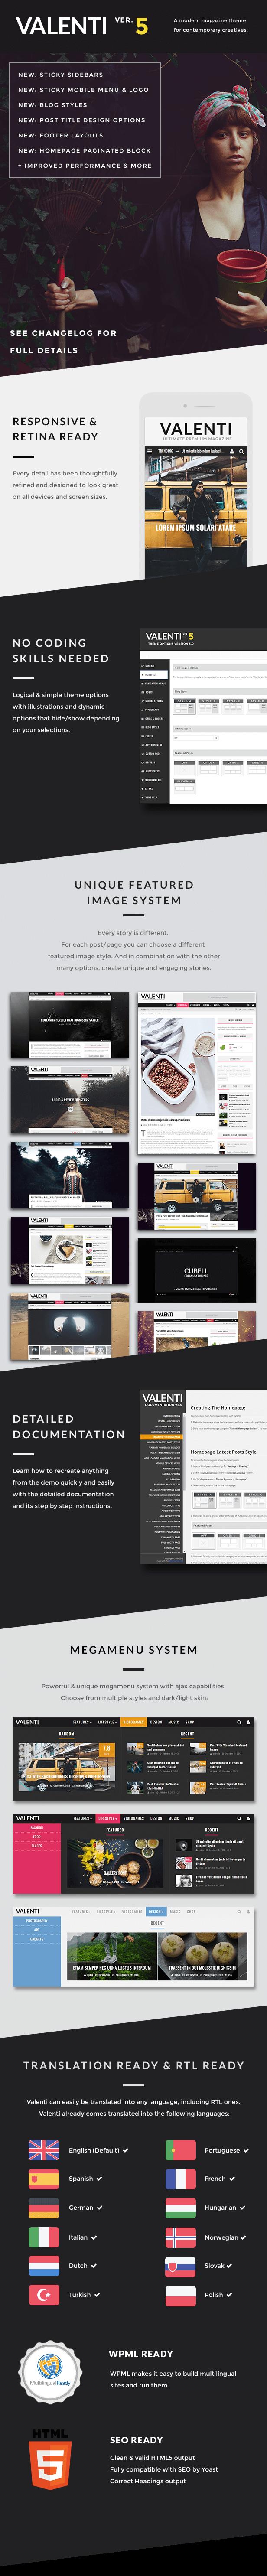 Tema de la revista Valenti WordPress para 2015